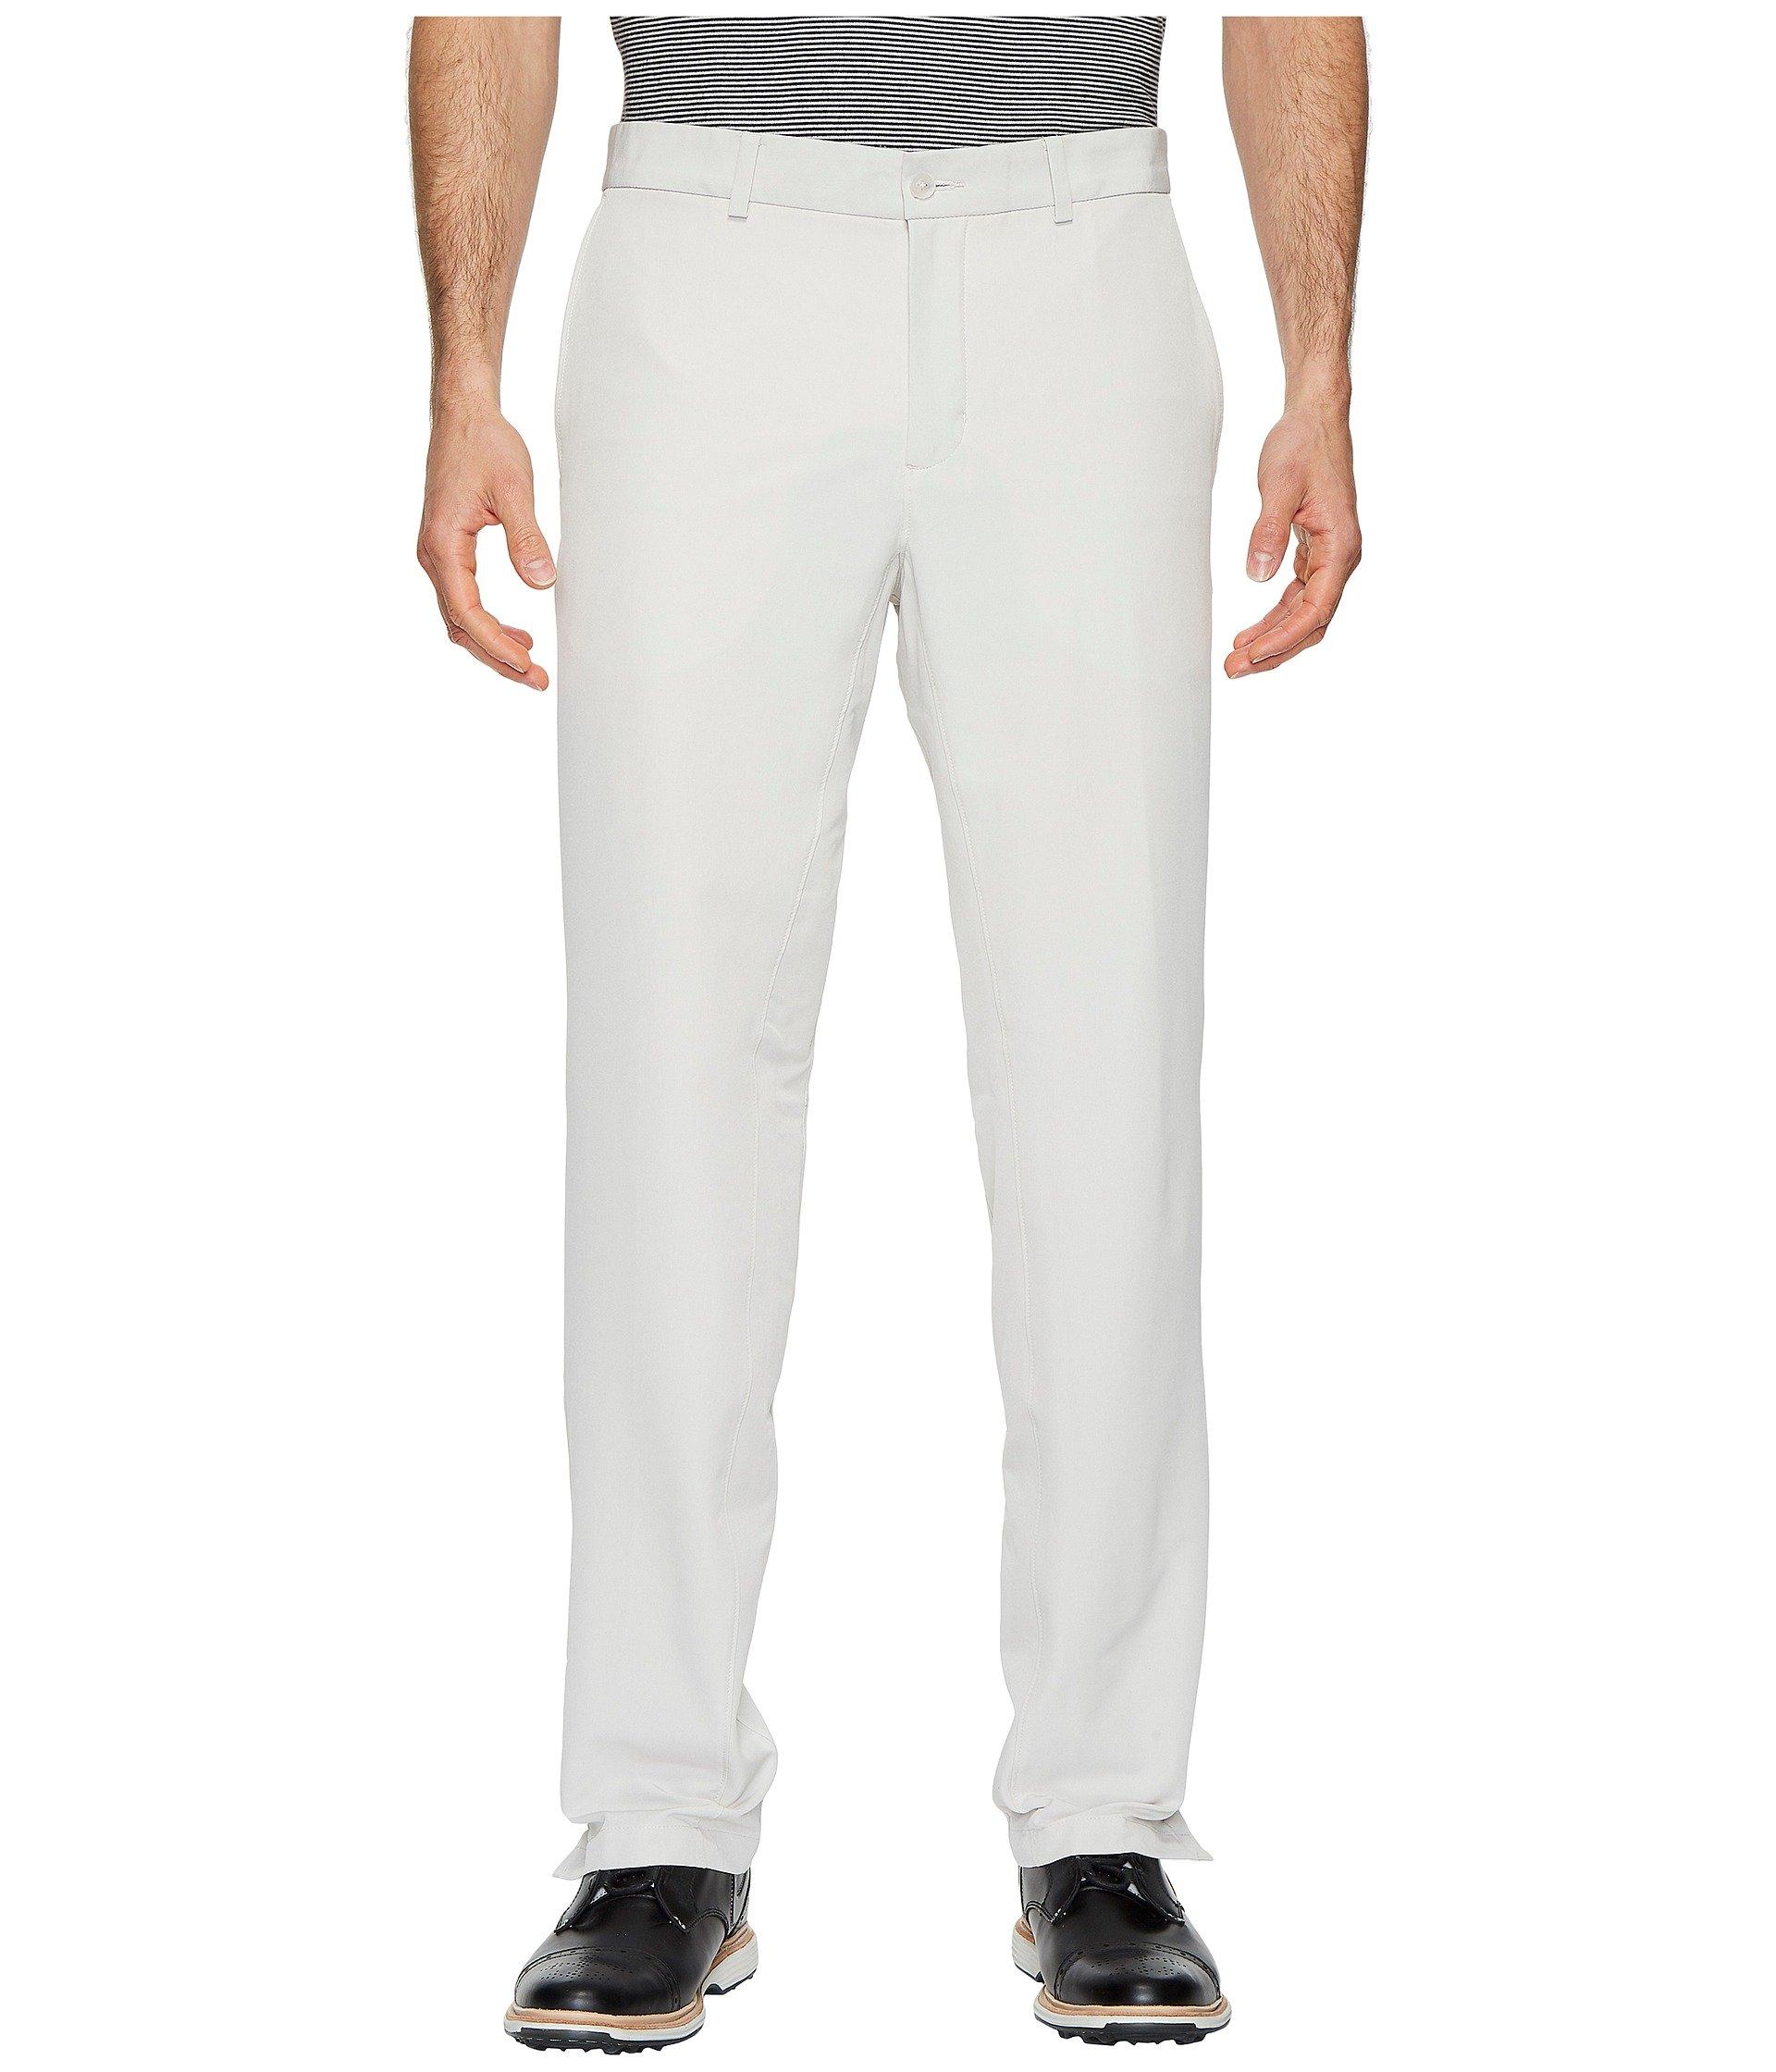 NIKE Men's Flex Hybrid Golf Pants, Light Bone/Light Bone, Size 33/34 by Nike